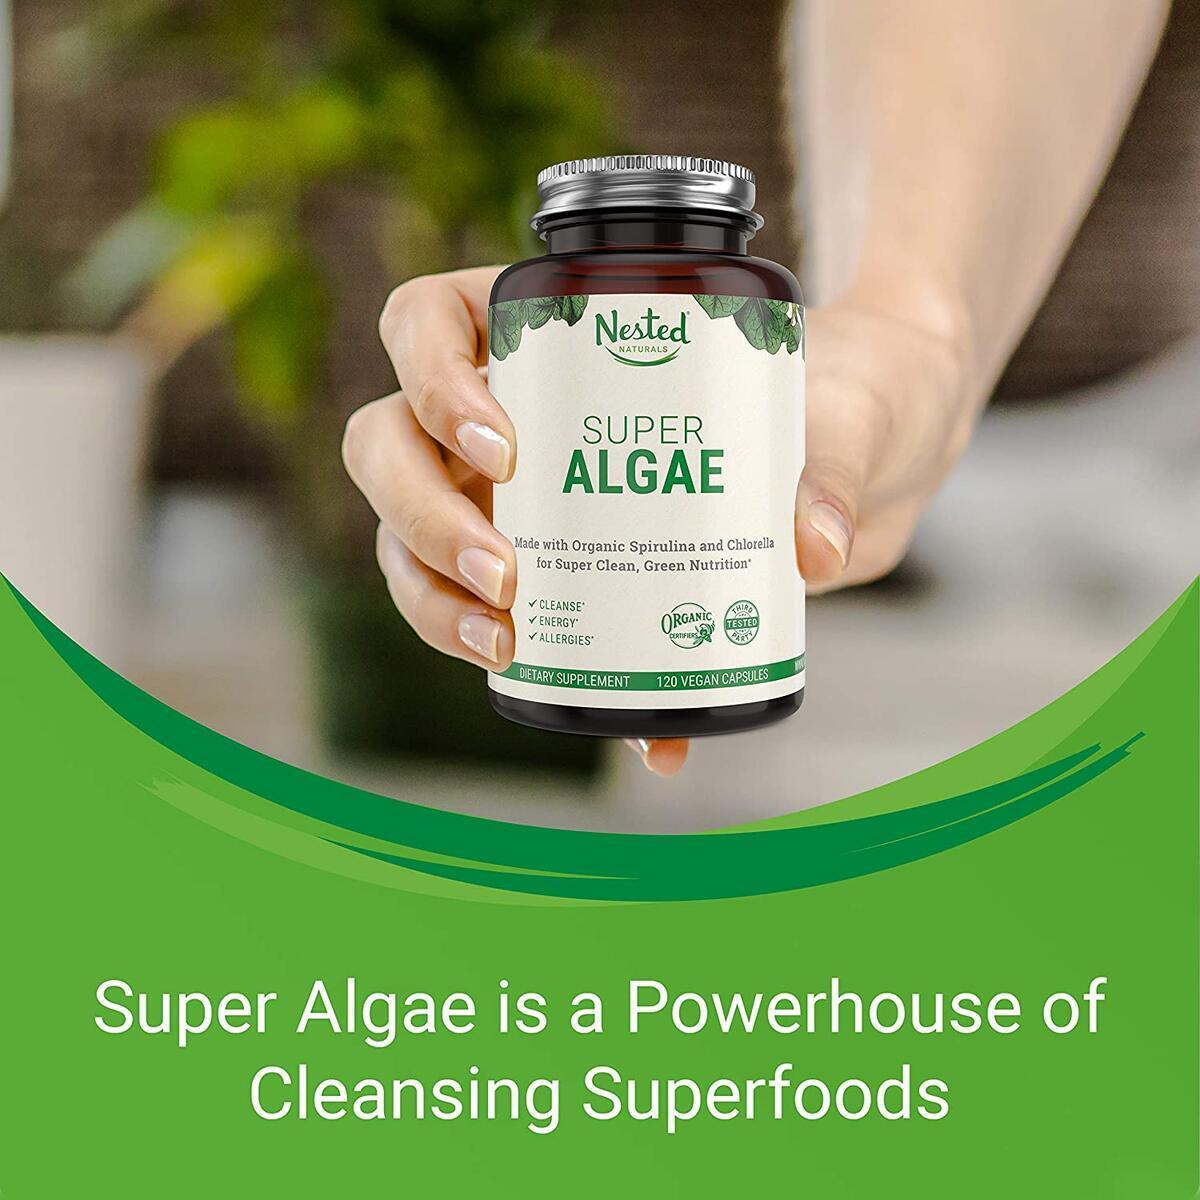 Nested Naturals Super Algae Powder 500mg | Certified Organic & Vegan Blue Green Algae Capsules | 50/50 Spirulina + Chlorella Superfood Algae Powder